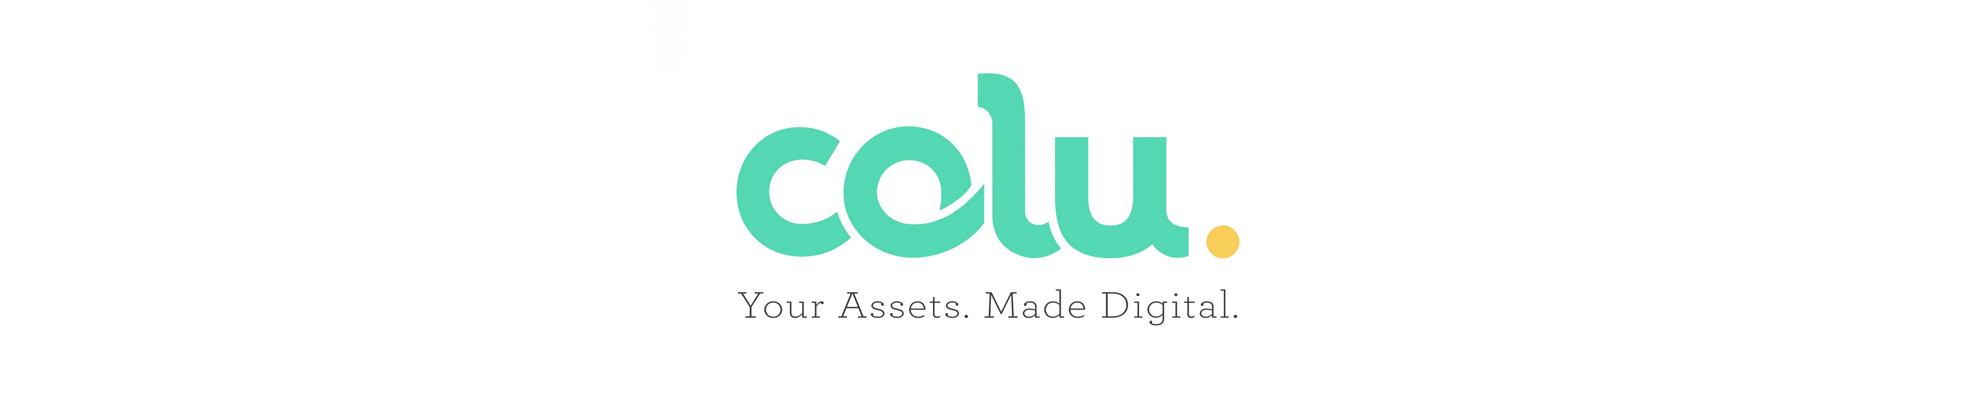 Colu Logo 1940x1116